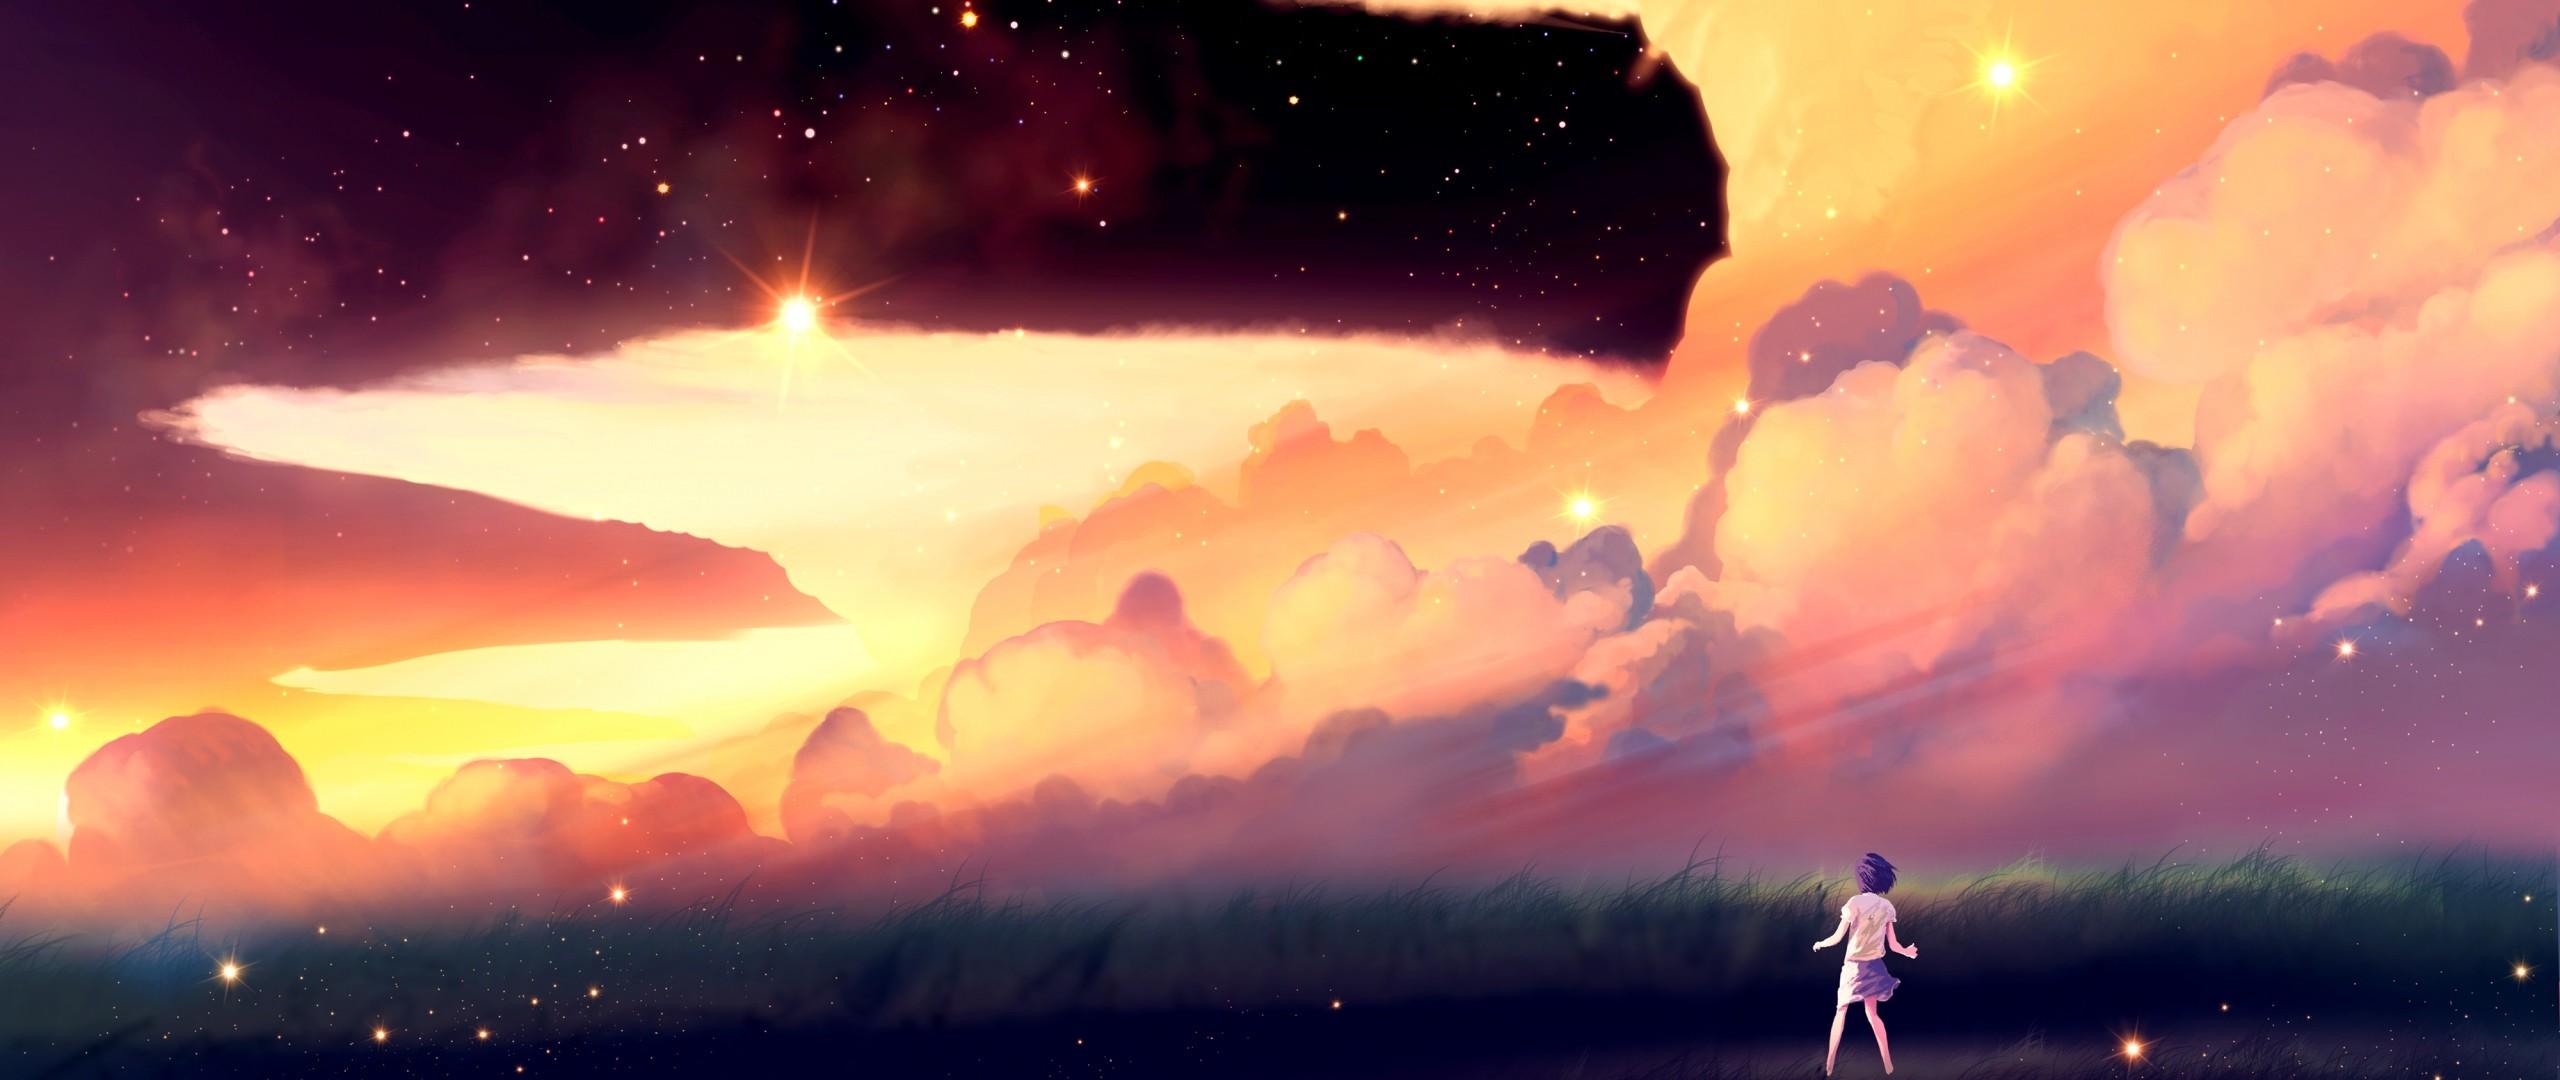 Preview wallpaper akio bako, anime, sunset, girl, clouds 2560×1080